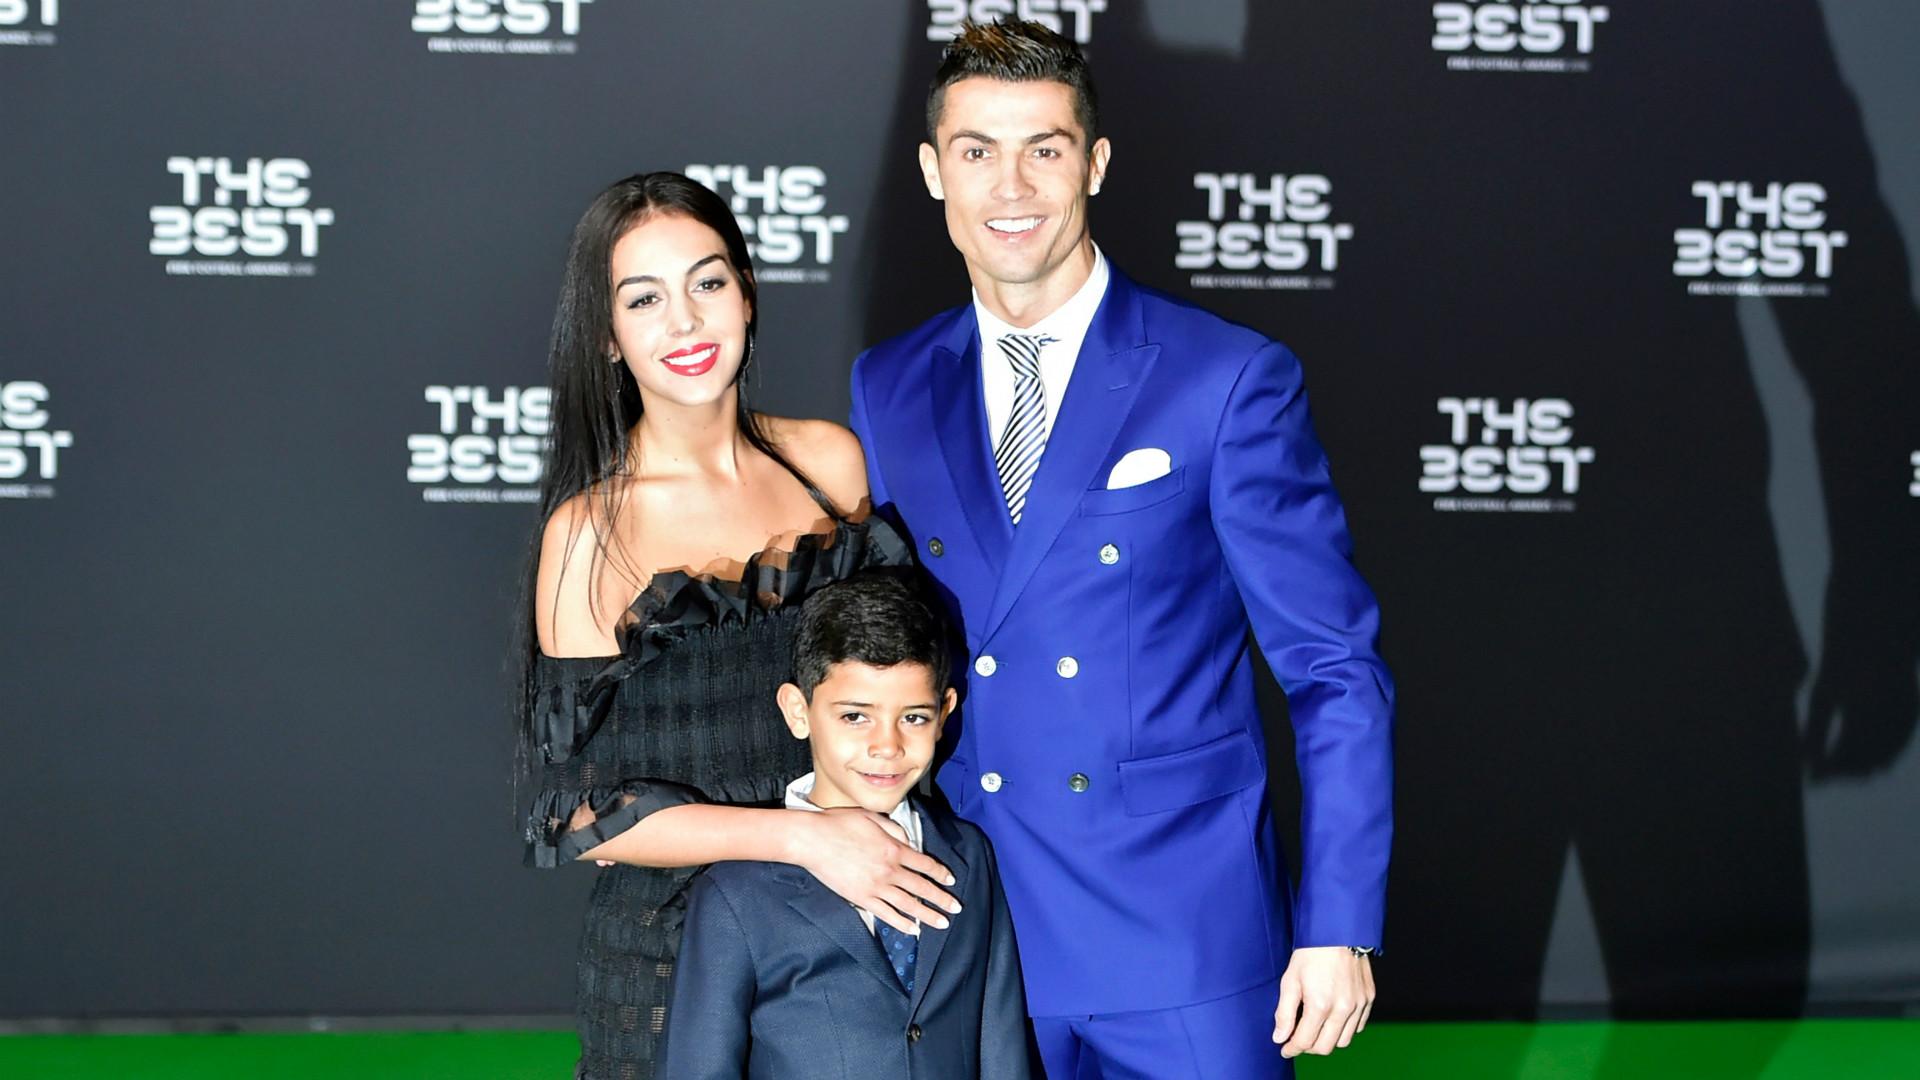 Cristiano Ronaldo stop judi bola dan nikahi Georgina Rodriguez